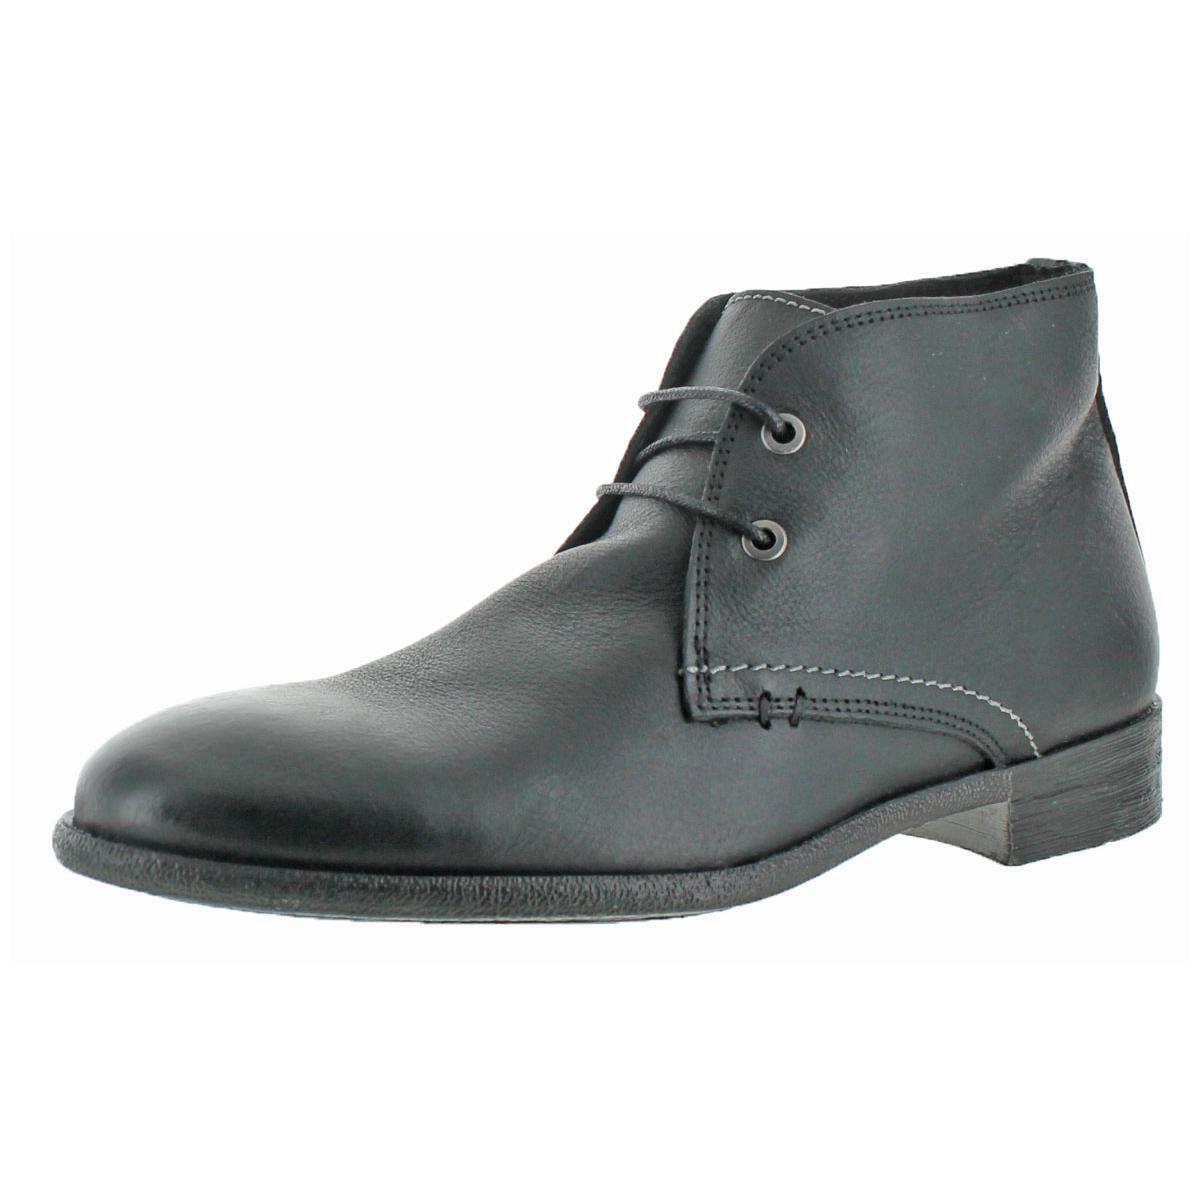 Robert Wayne Mens Wisconsin Black Chukka Boots Shoes 10.5 Medium (D) BHFO 9021